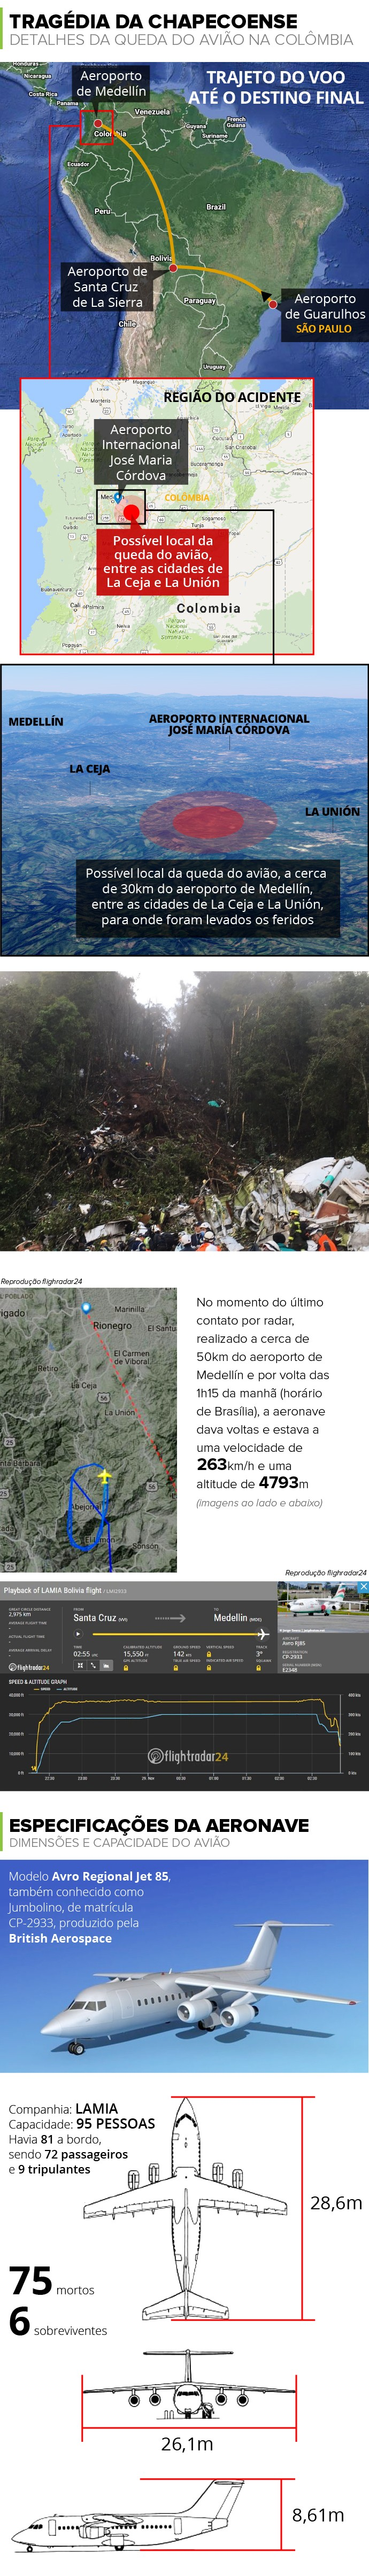 Info-QUEDA-AVIAO-Chapecoense-I (Foto: infoesporte)